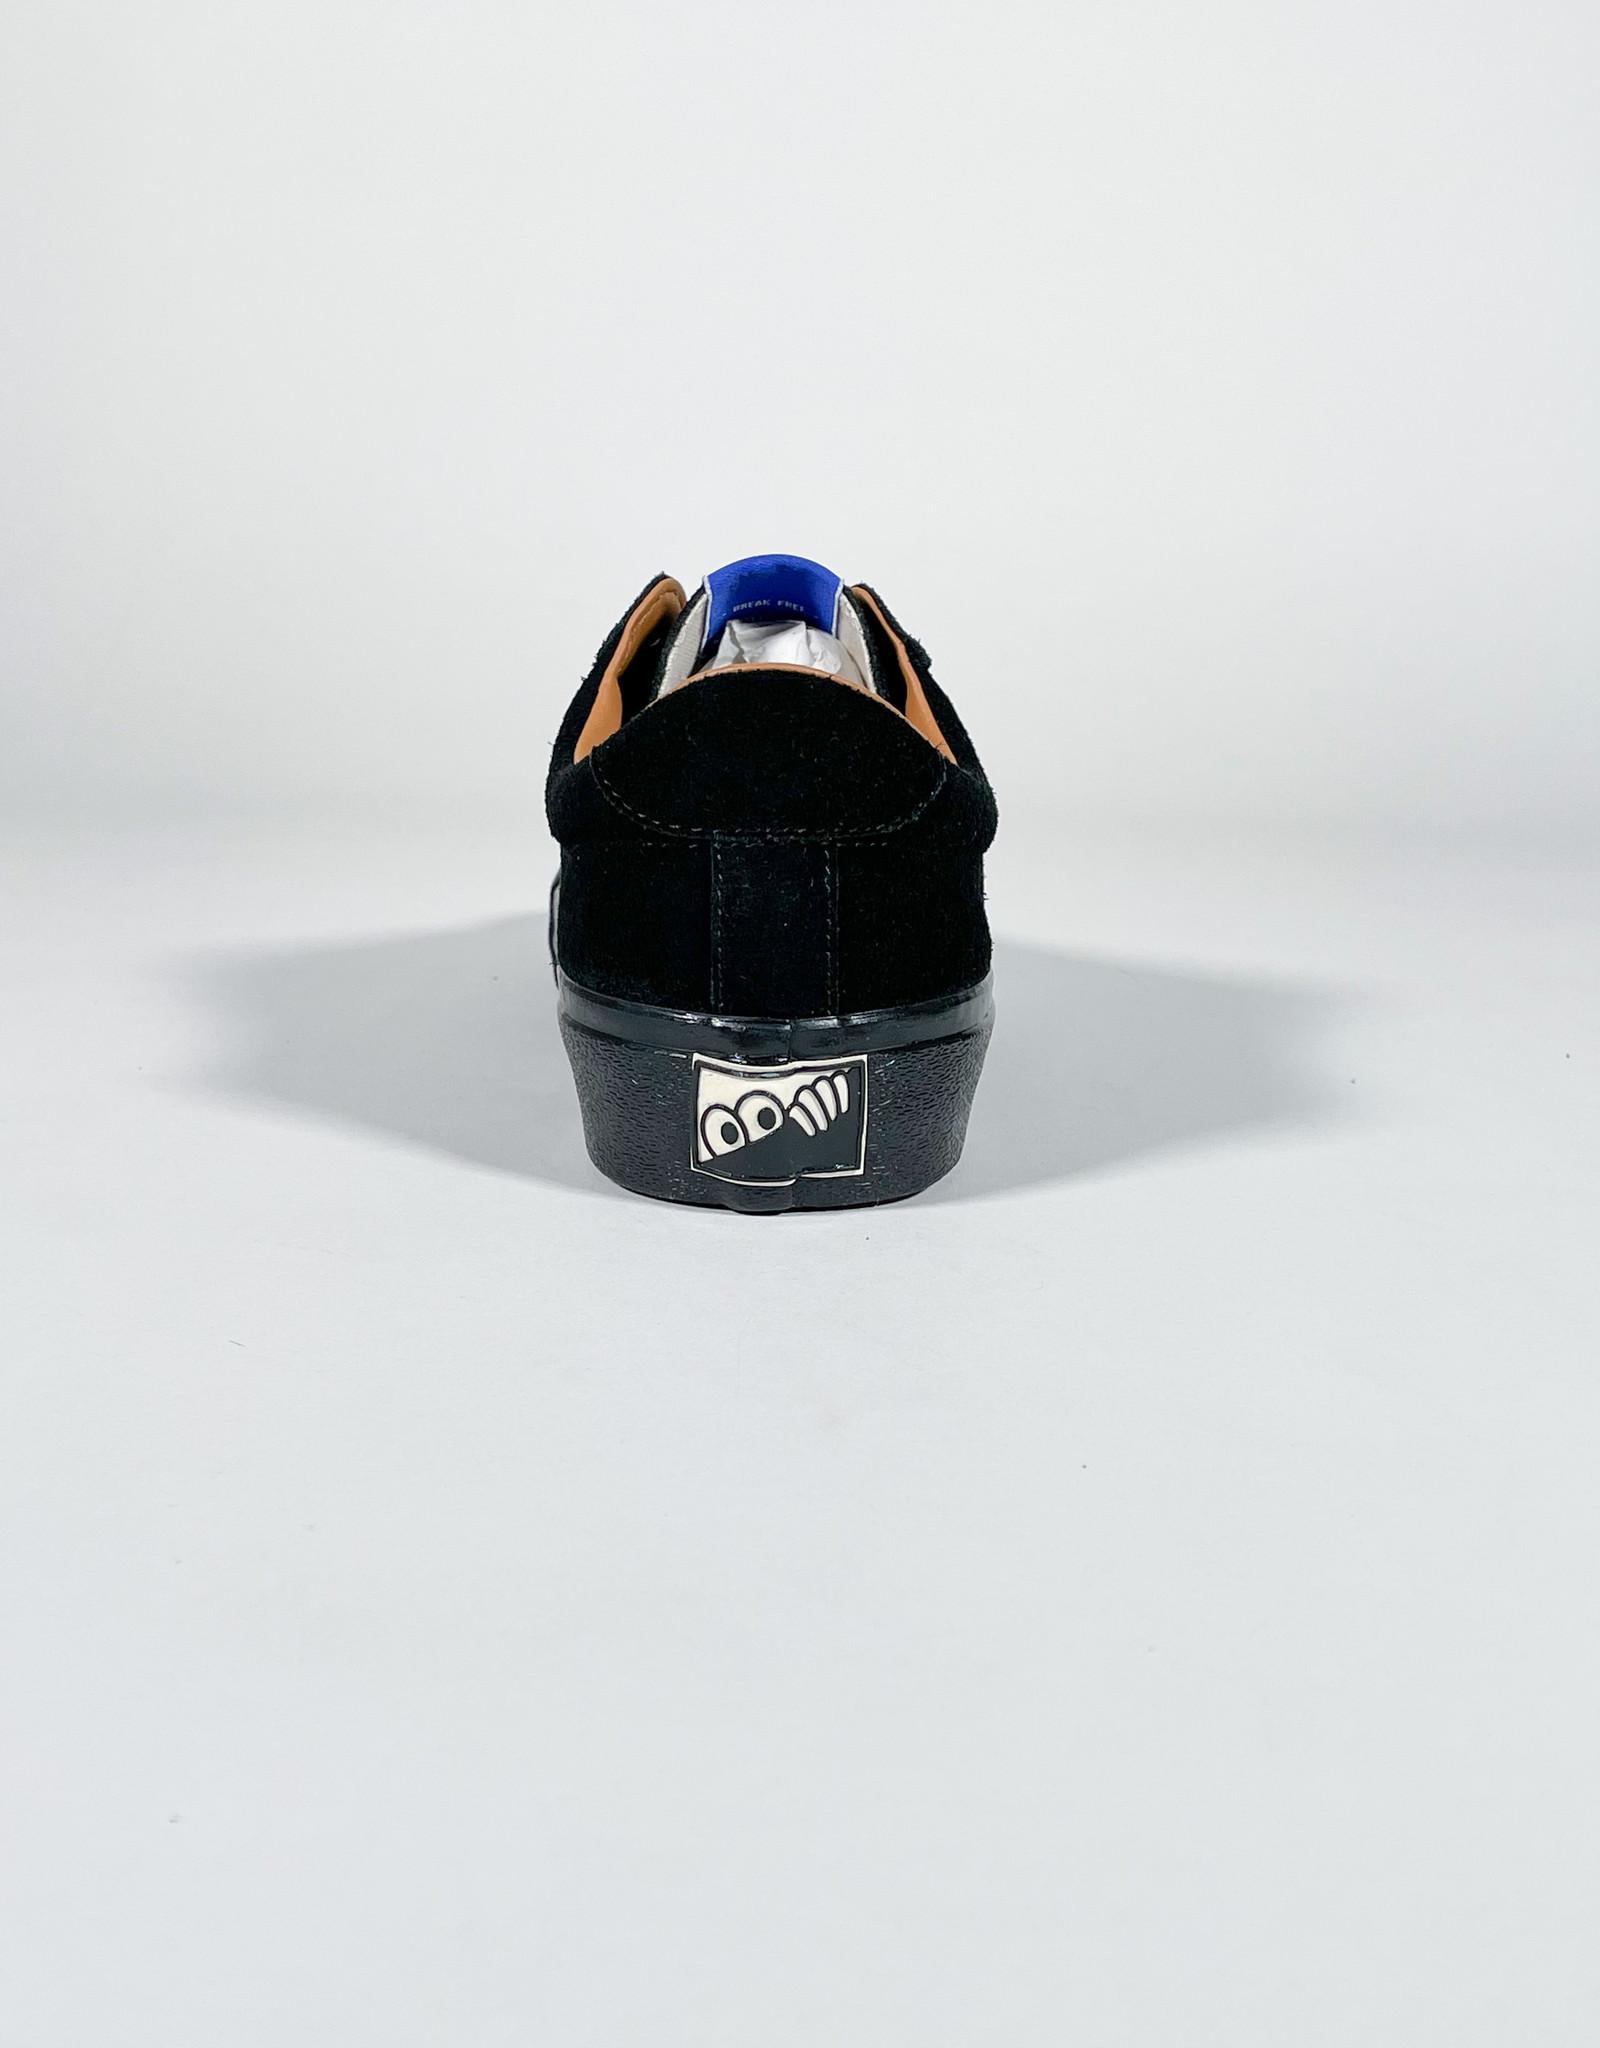 LAST RESORT LAST RESORT VM001 - SUEDE BLACK/BLACK